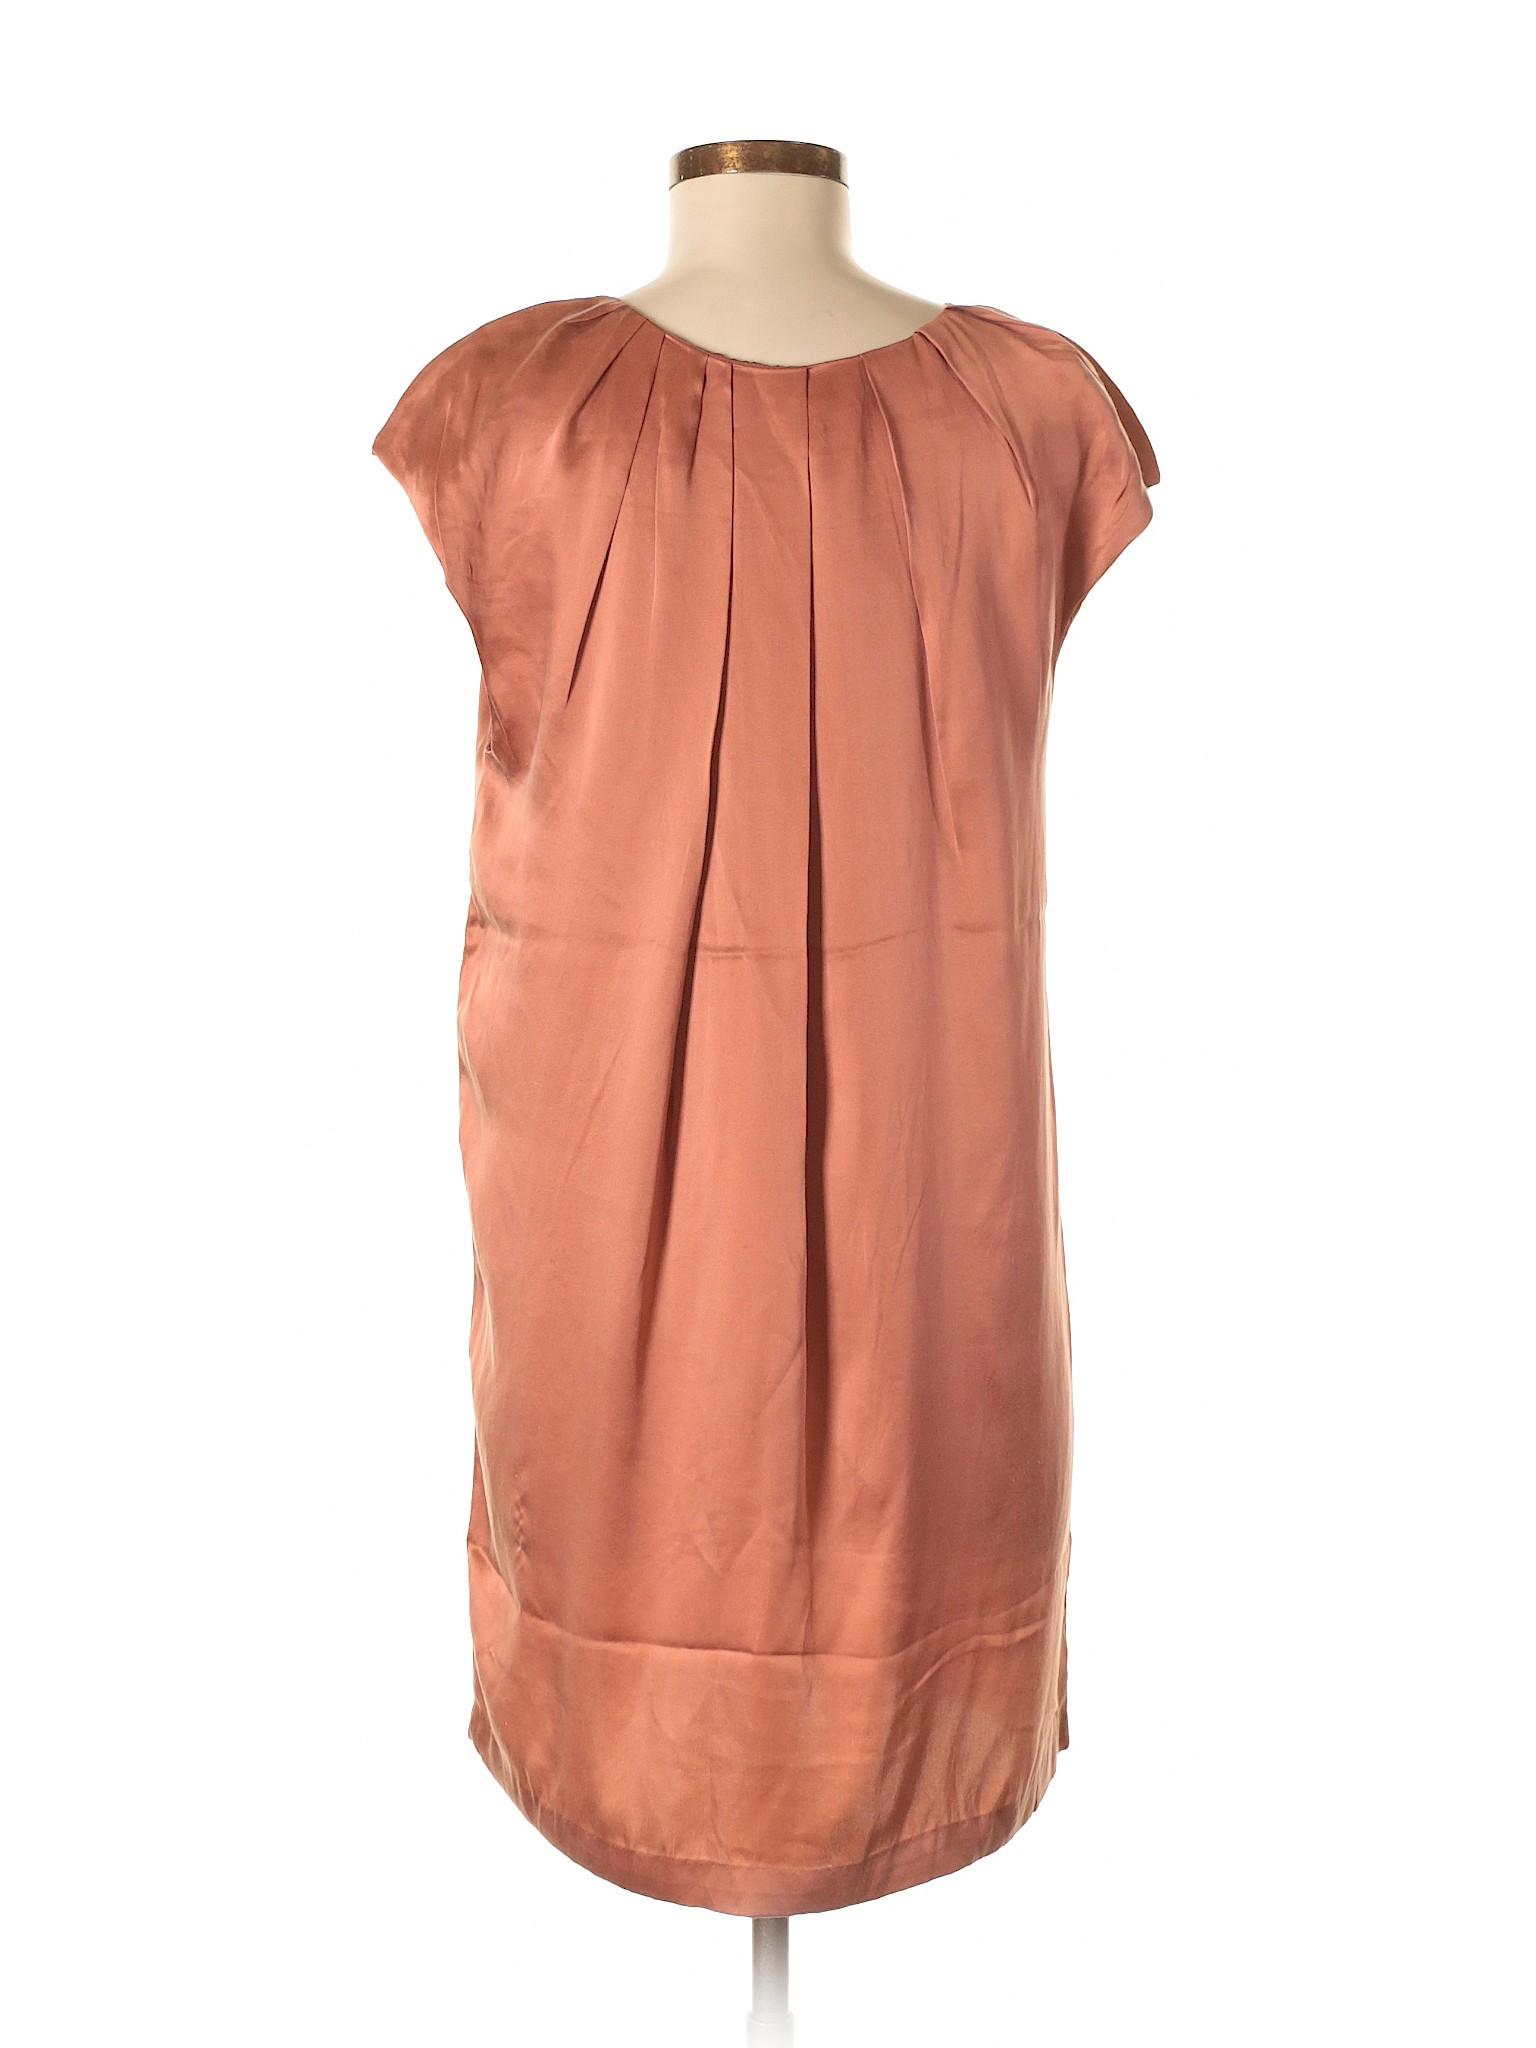 Joie Dress Selling Joie Casual Dress Selling Joie Selling Casual Casual Dress HTn1qt4